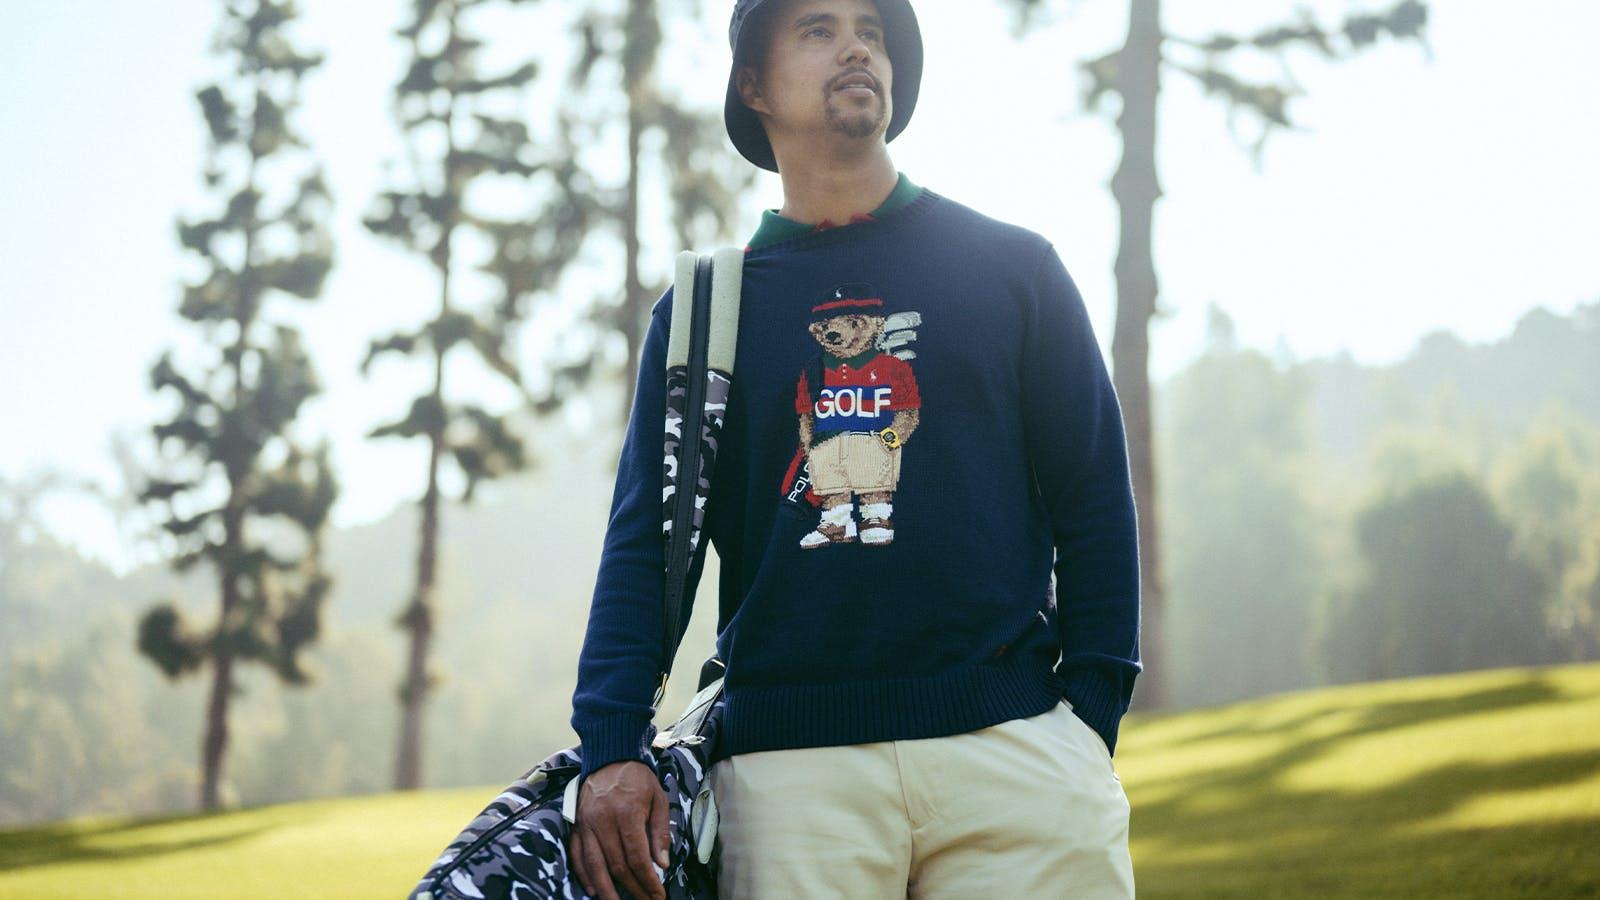 Polo Golf Ralph Lauren   Men's Golf Clothing   TRENDYGOLFUSA.COM